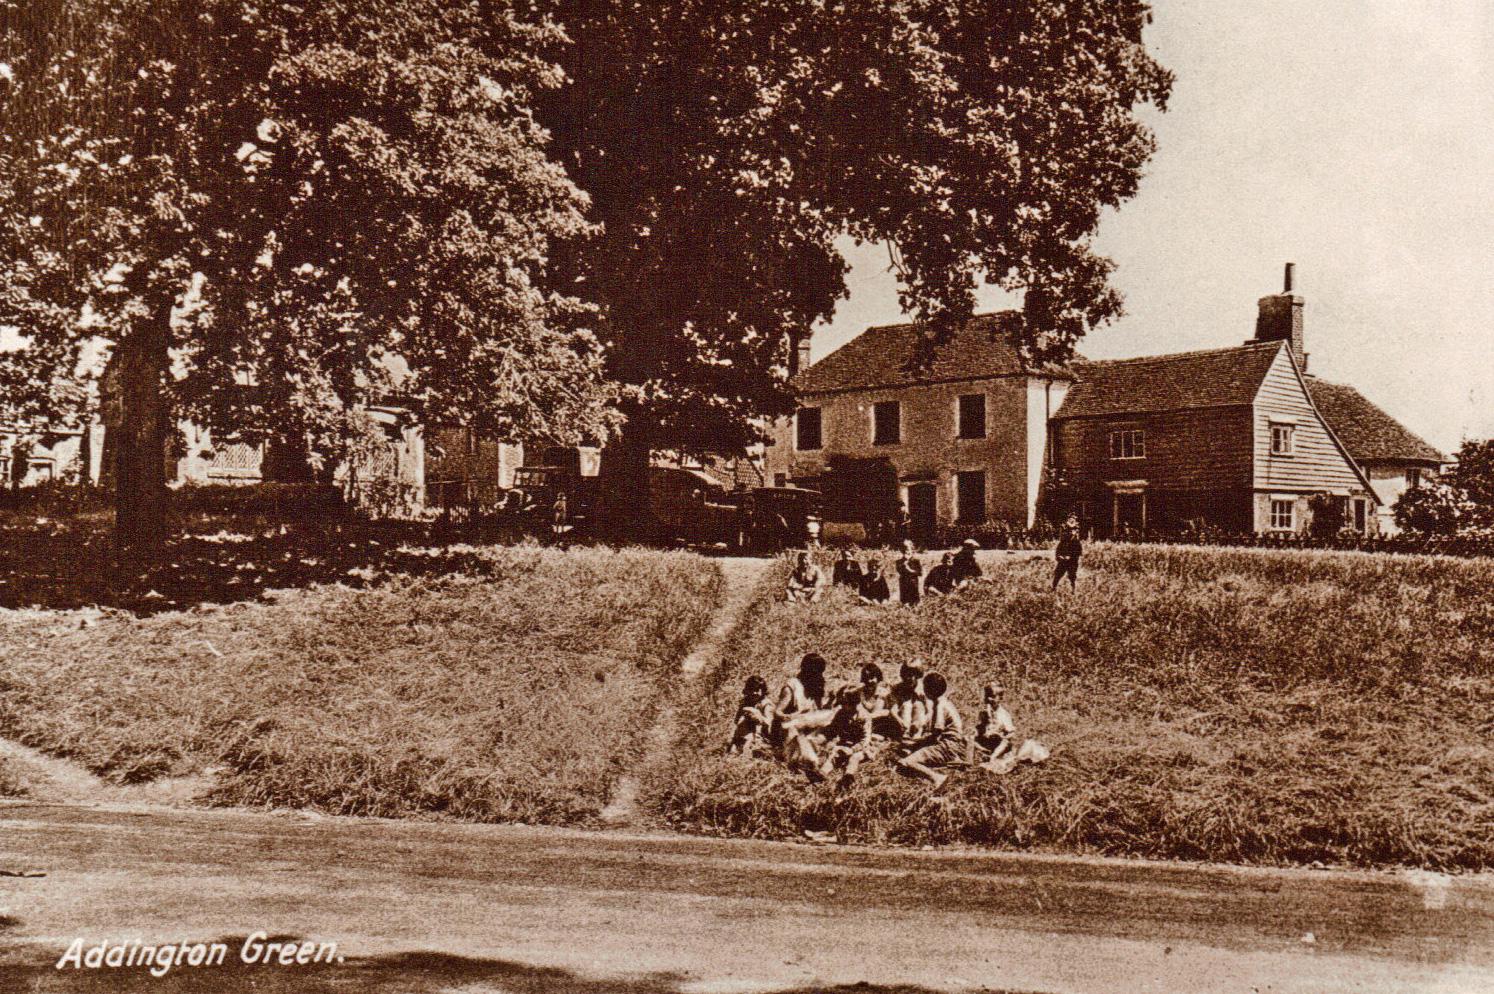 School children on Green 1930s